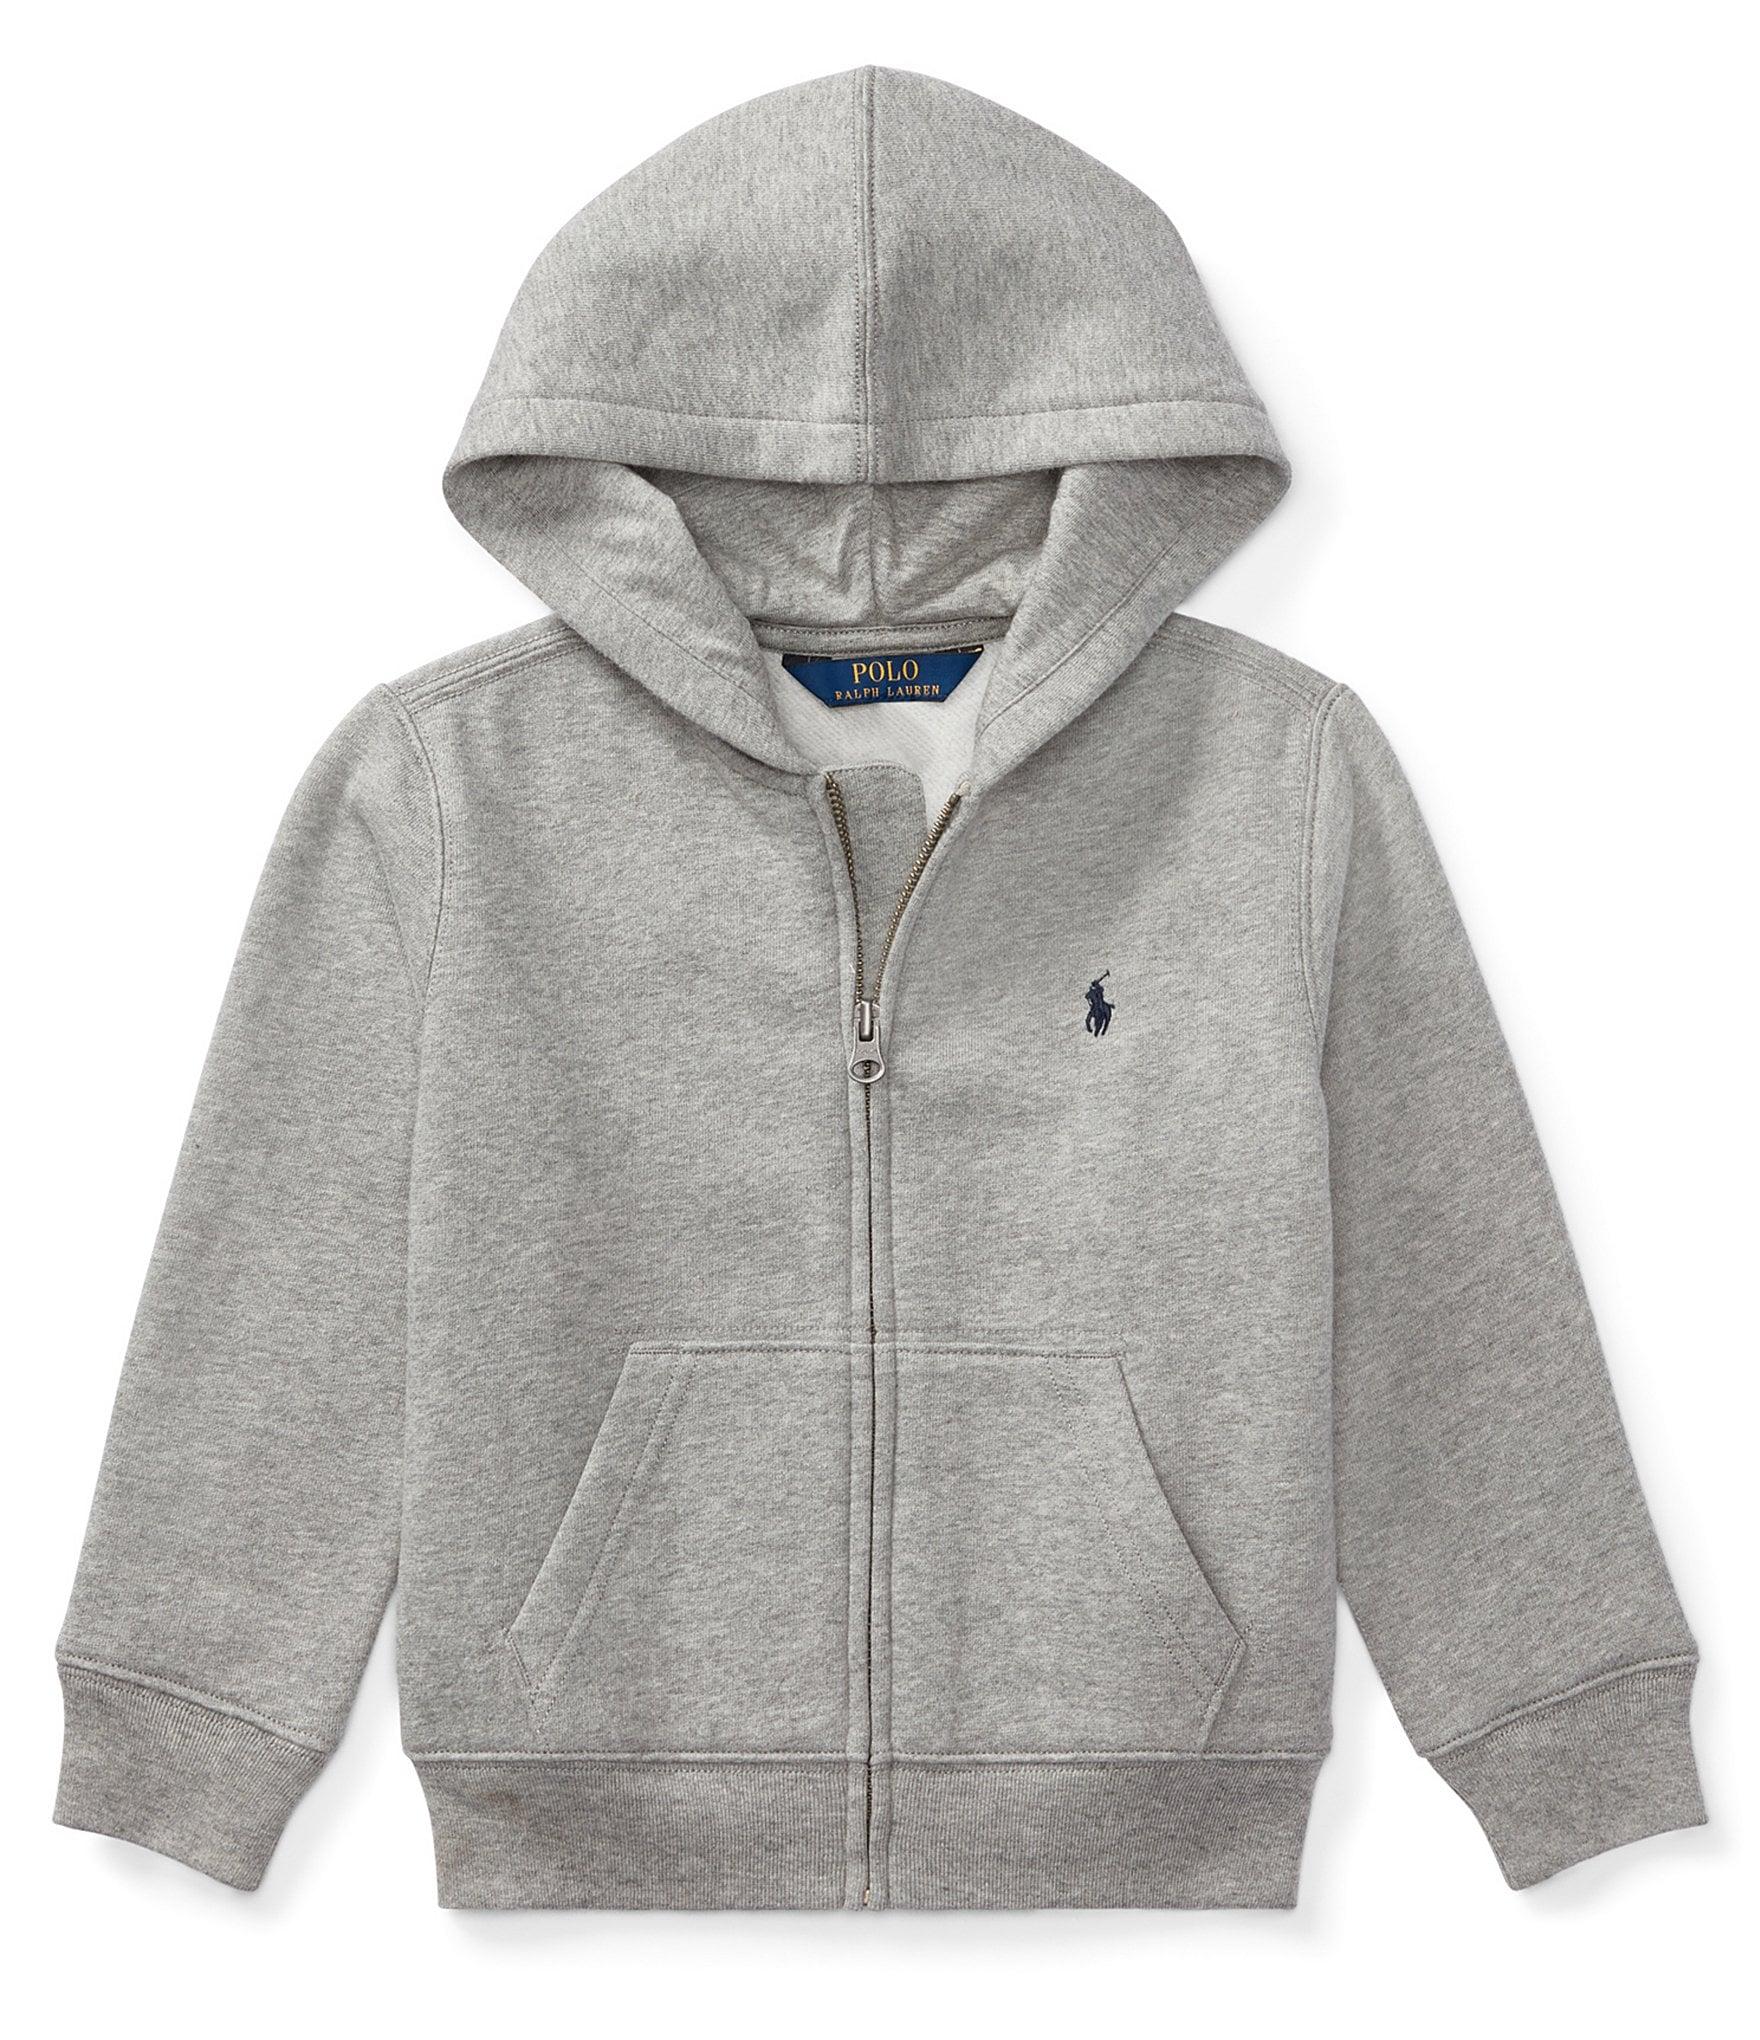 8084b279 Ralph Lauren Childrenswear Little Boys 2T-7 Full-Zip Hoodie